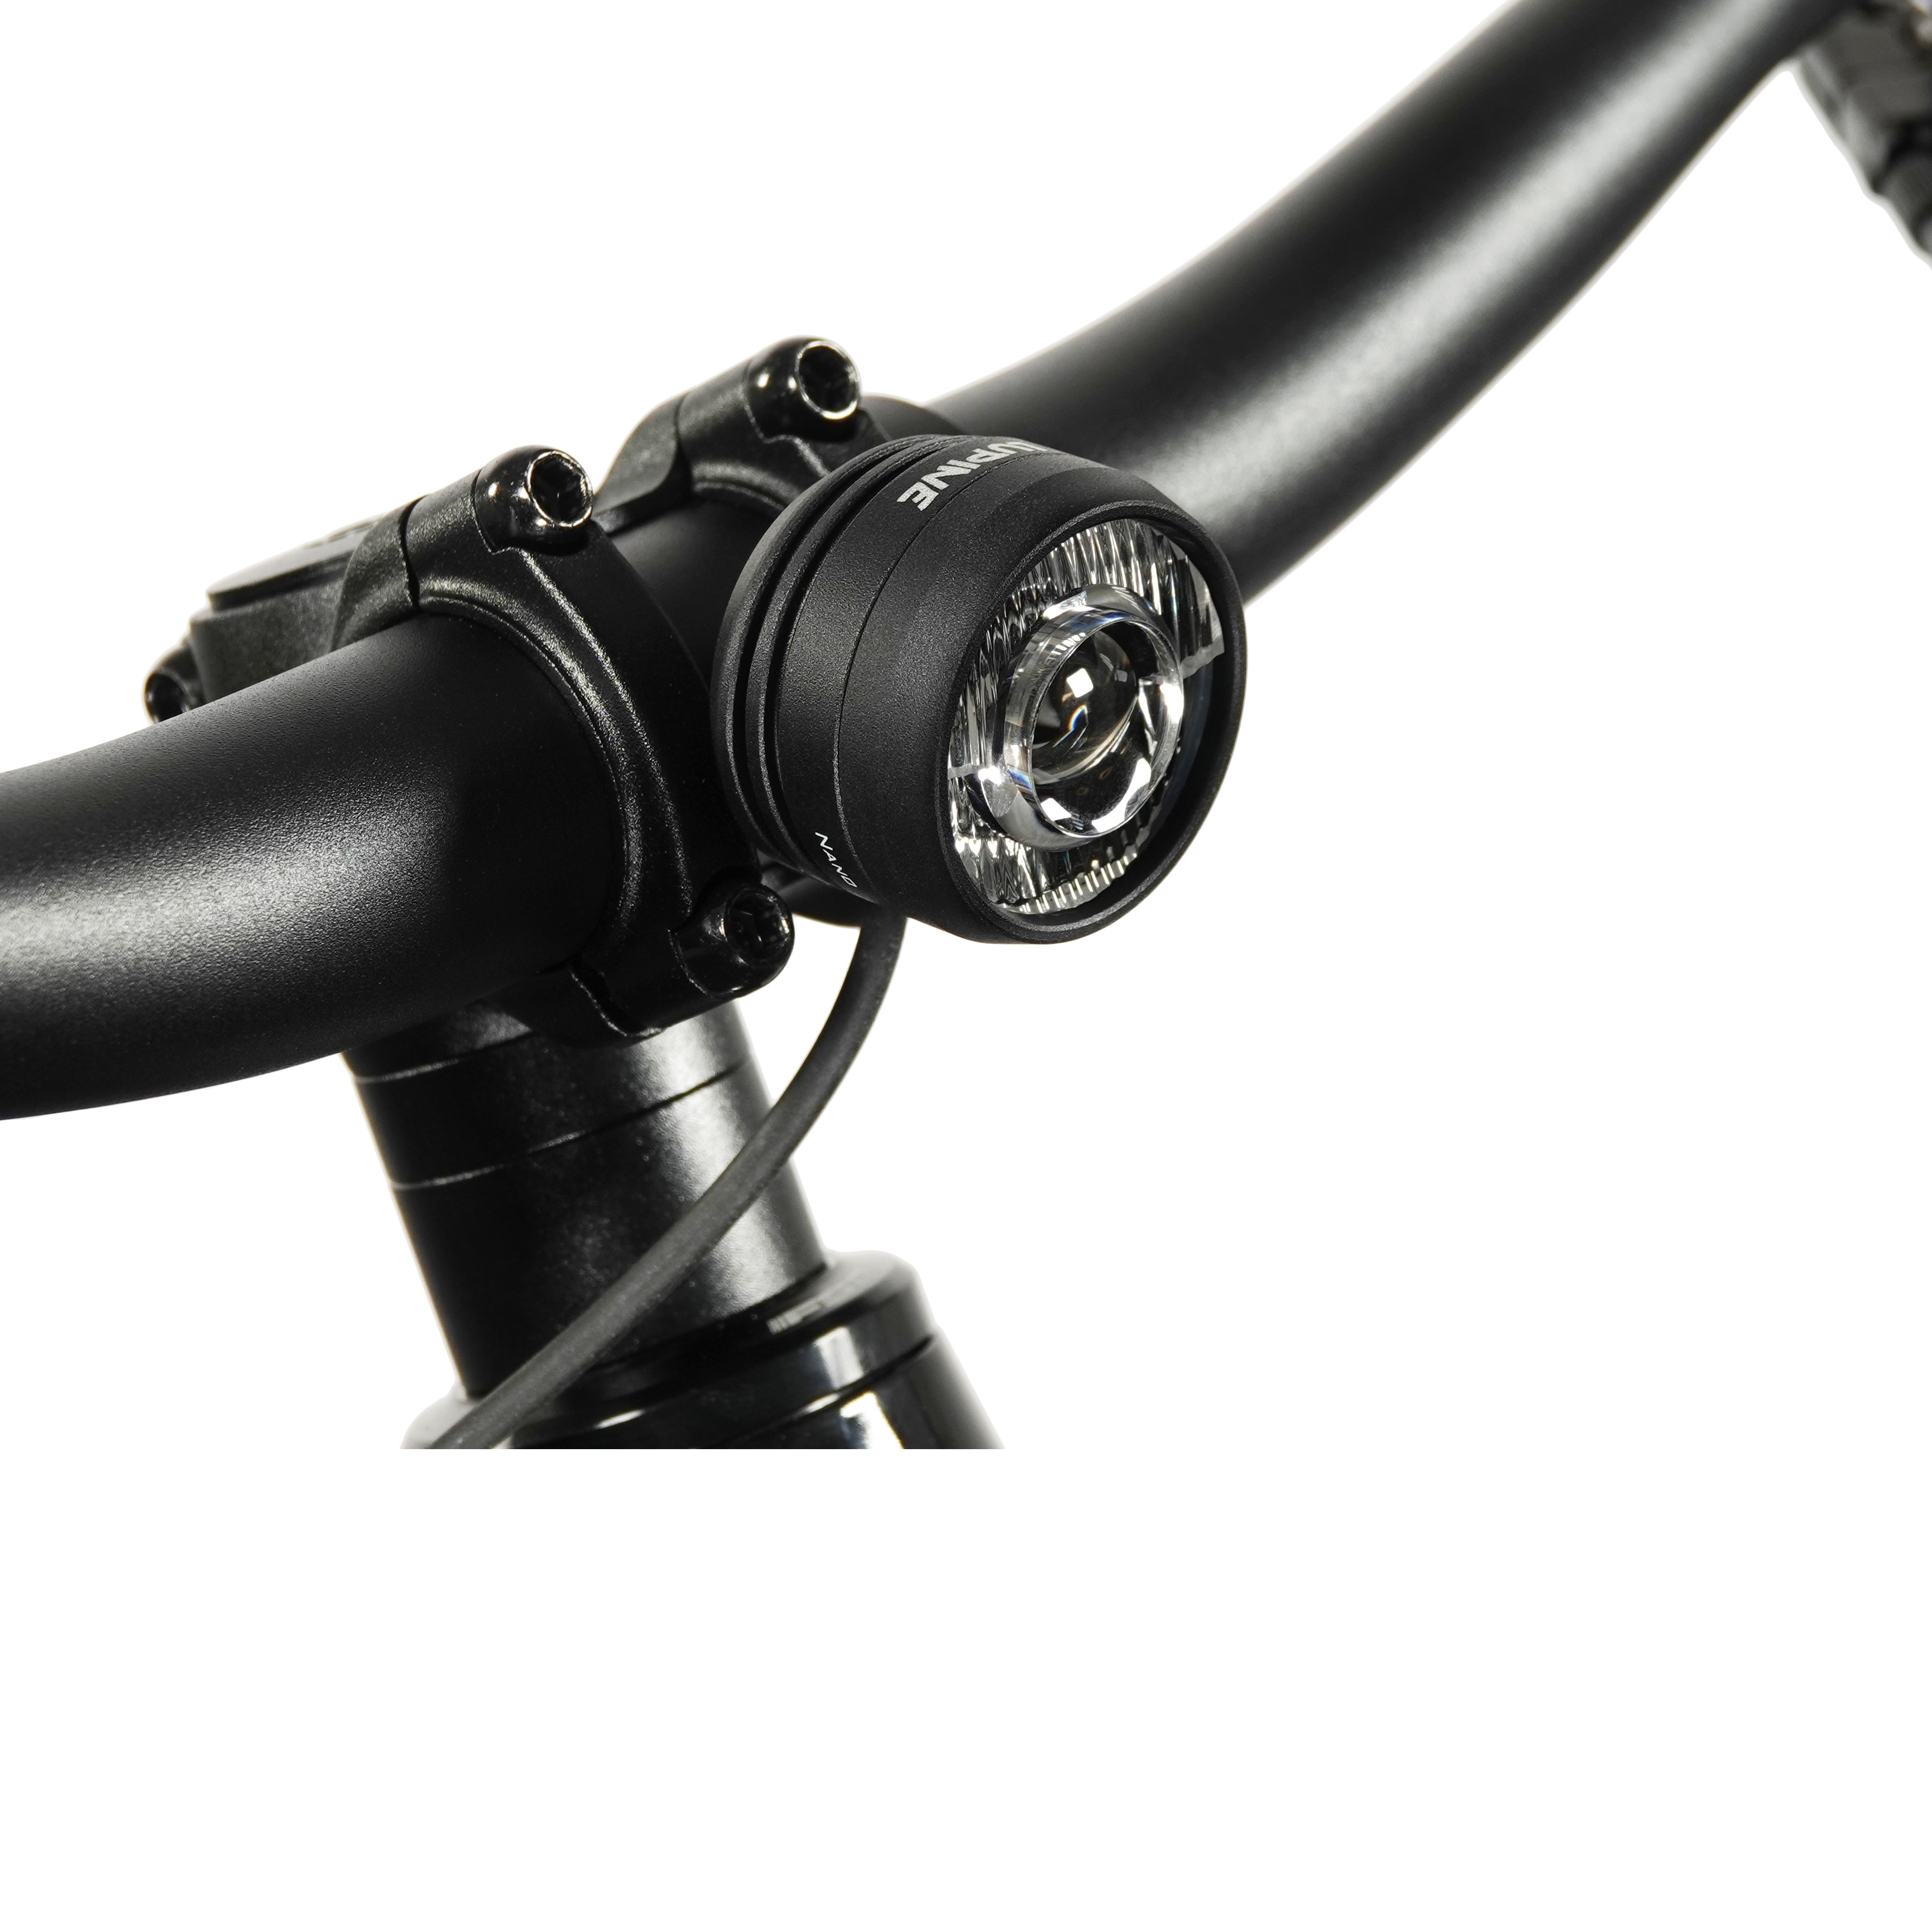 Lupine SL SF Nano 31.8 mm